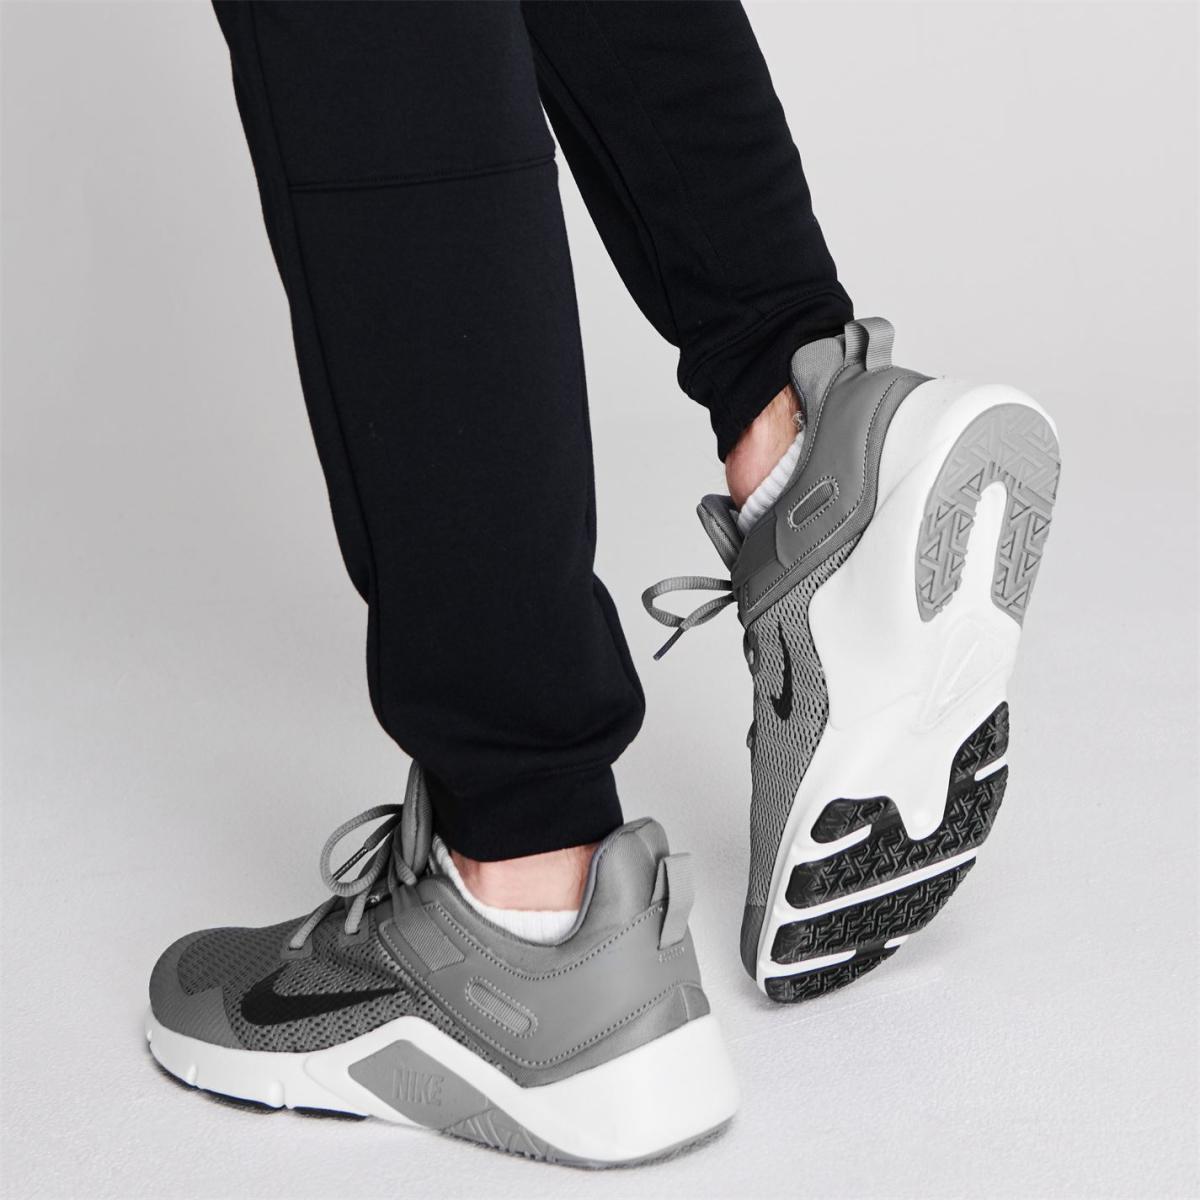 Nike Legend Essential Turnschuhe Herren Sneaker Sportschuhe Laufschuhe 1016